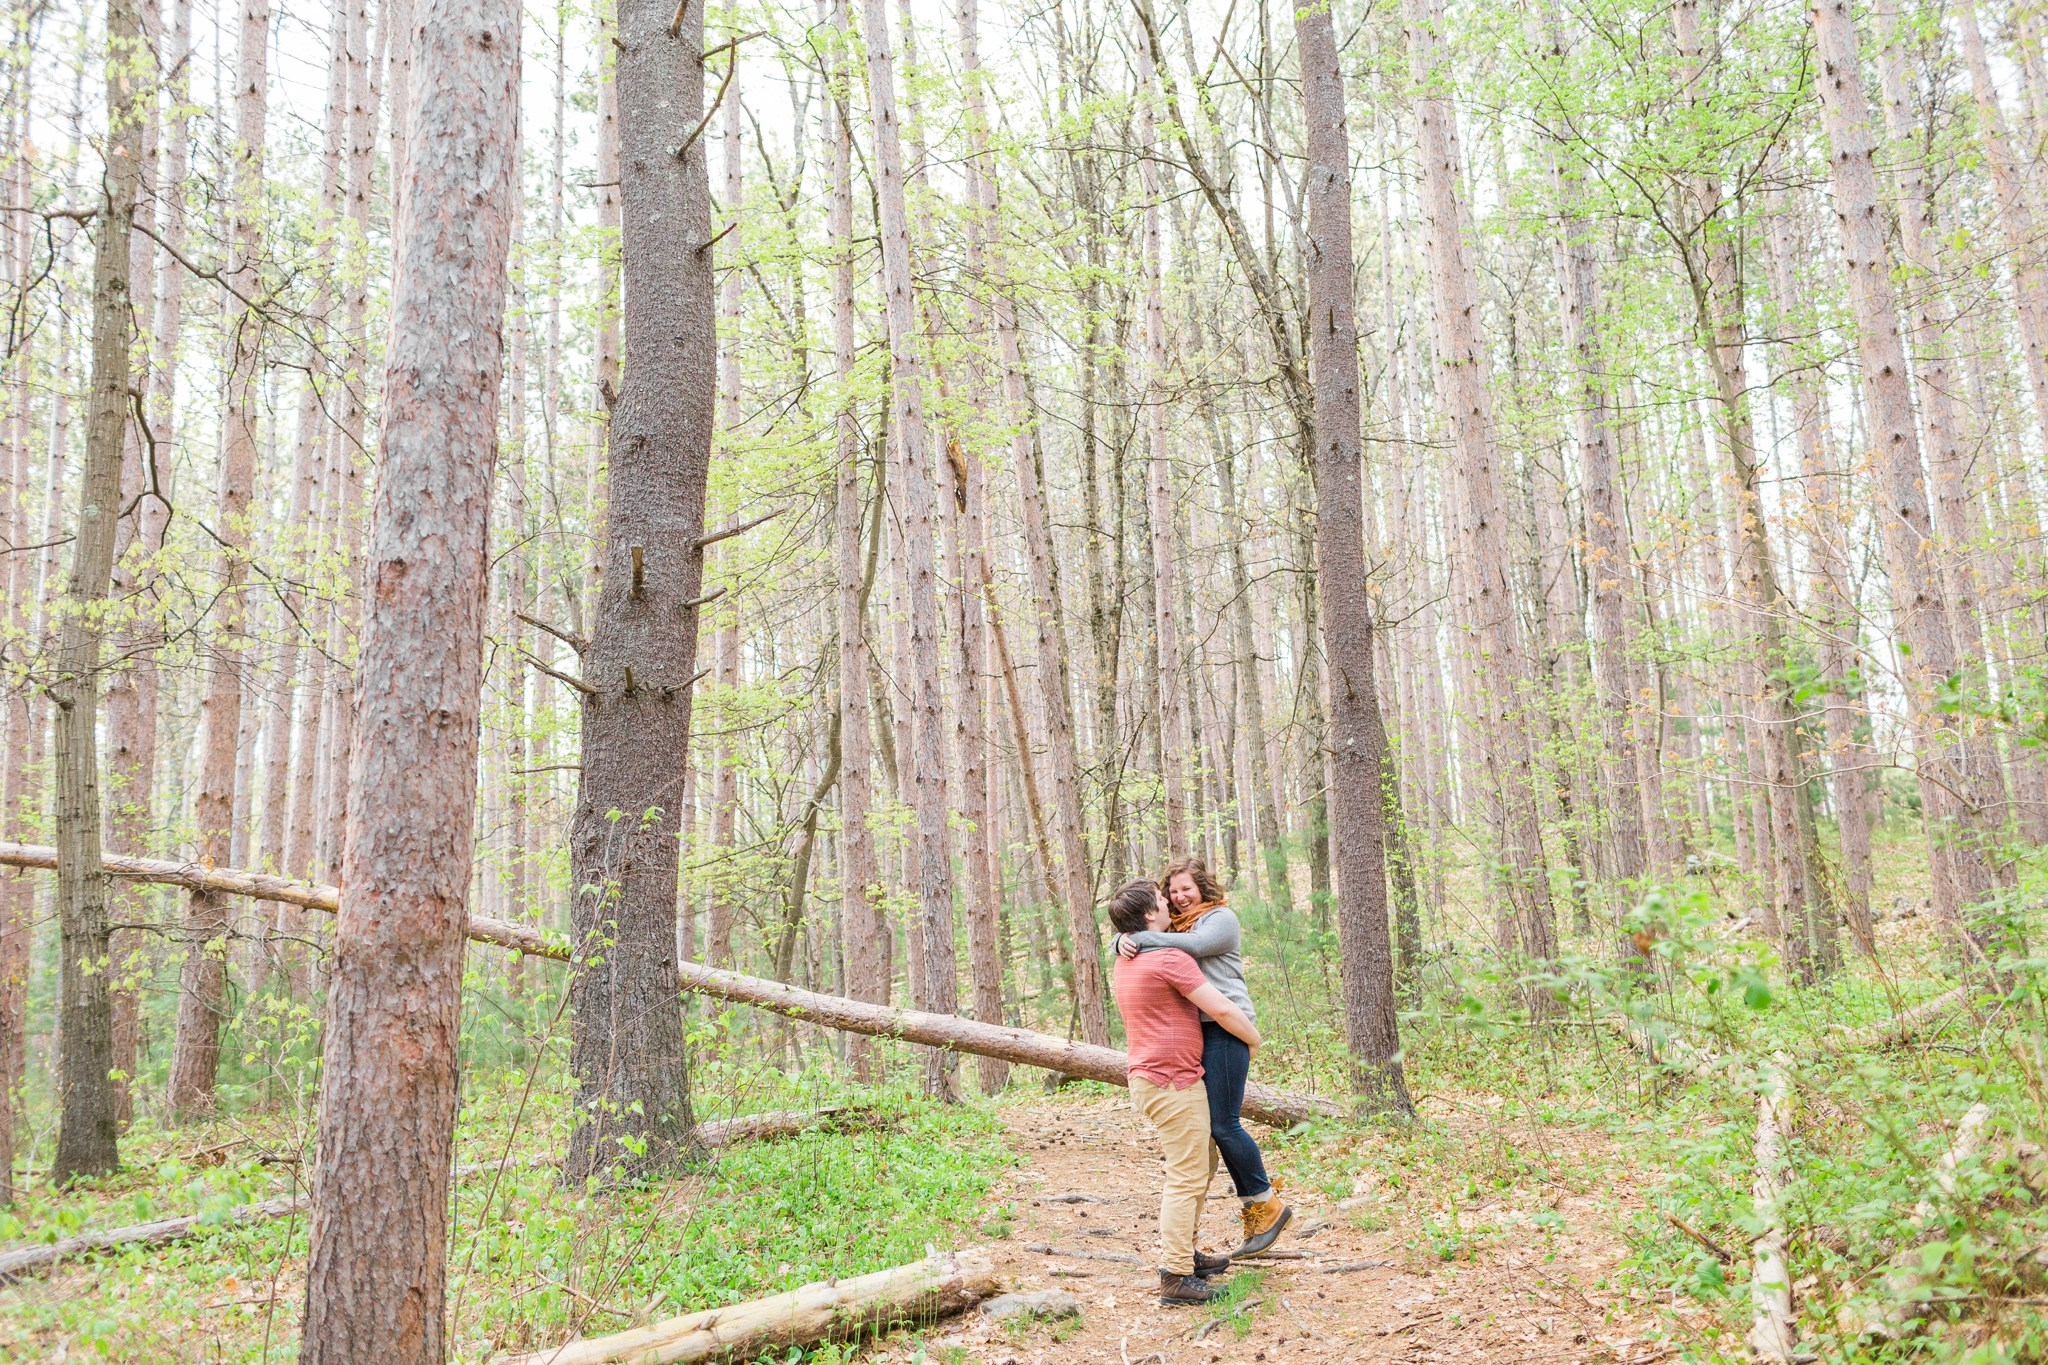 woods_north_shore_ma_engagement_photos_deborah_zoe_00001.JPG